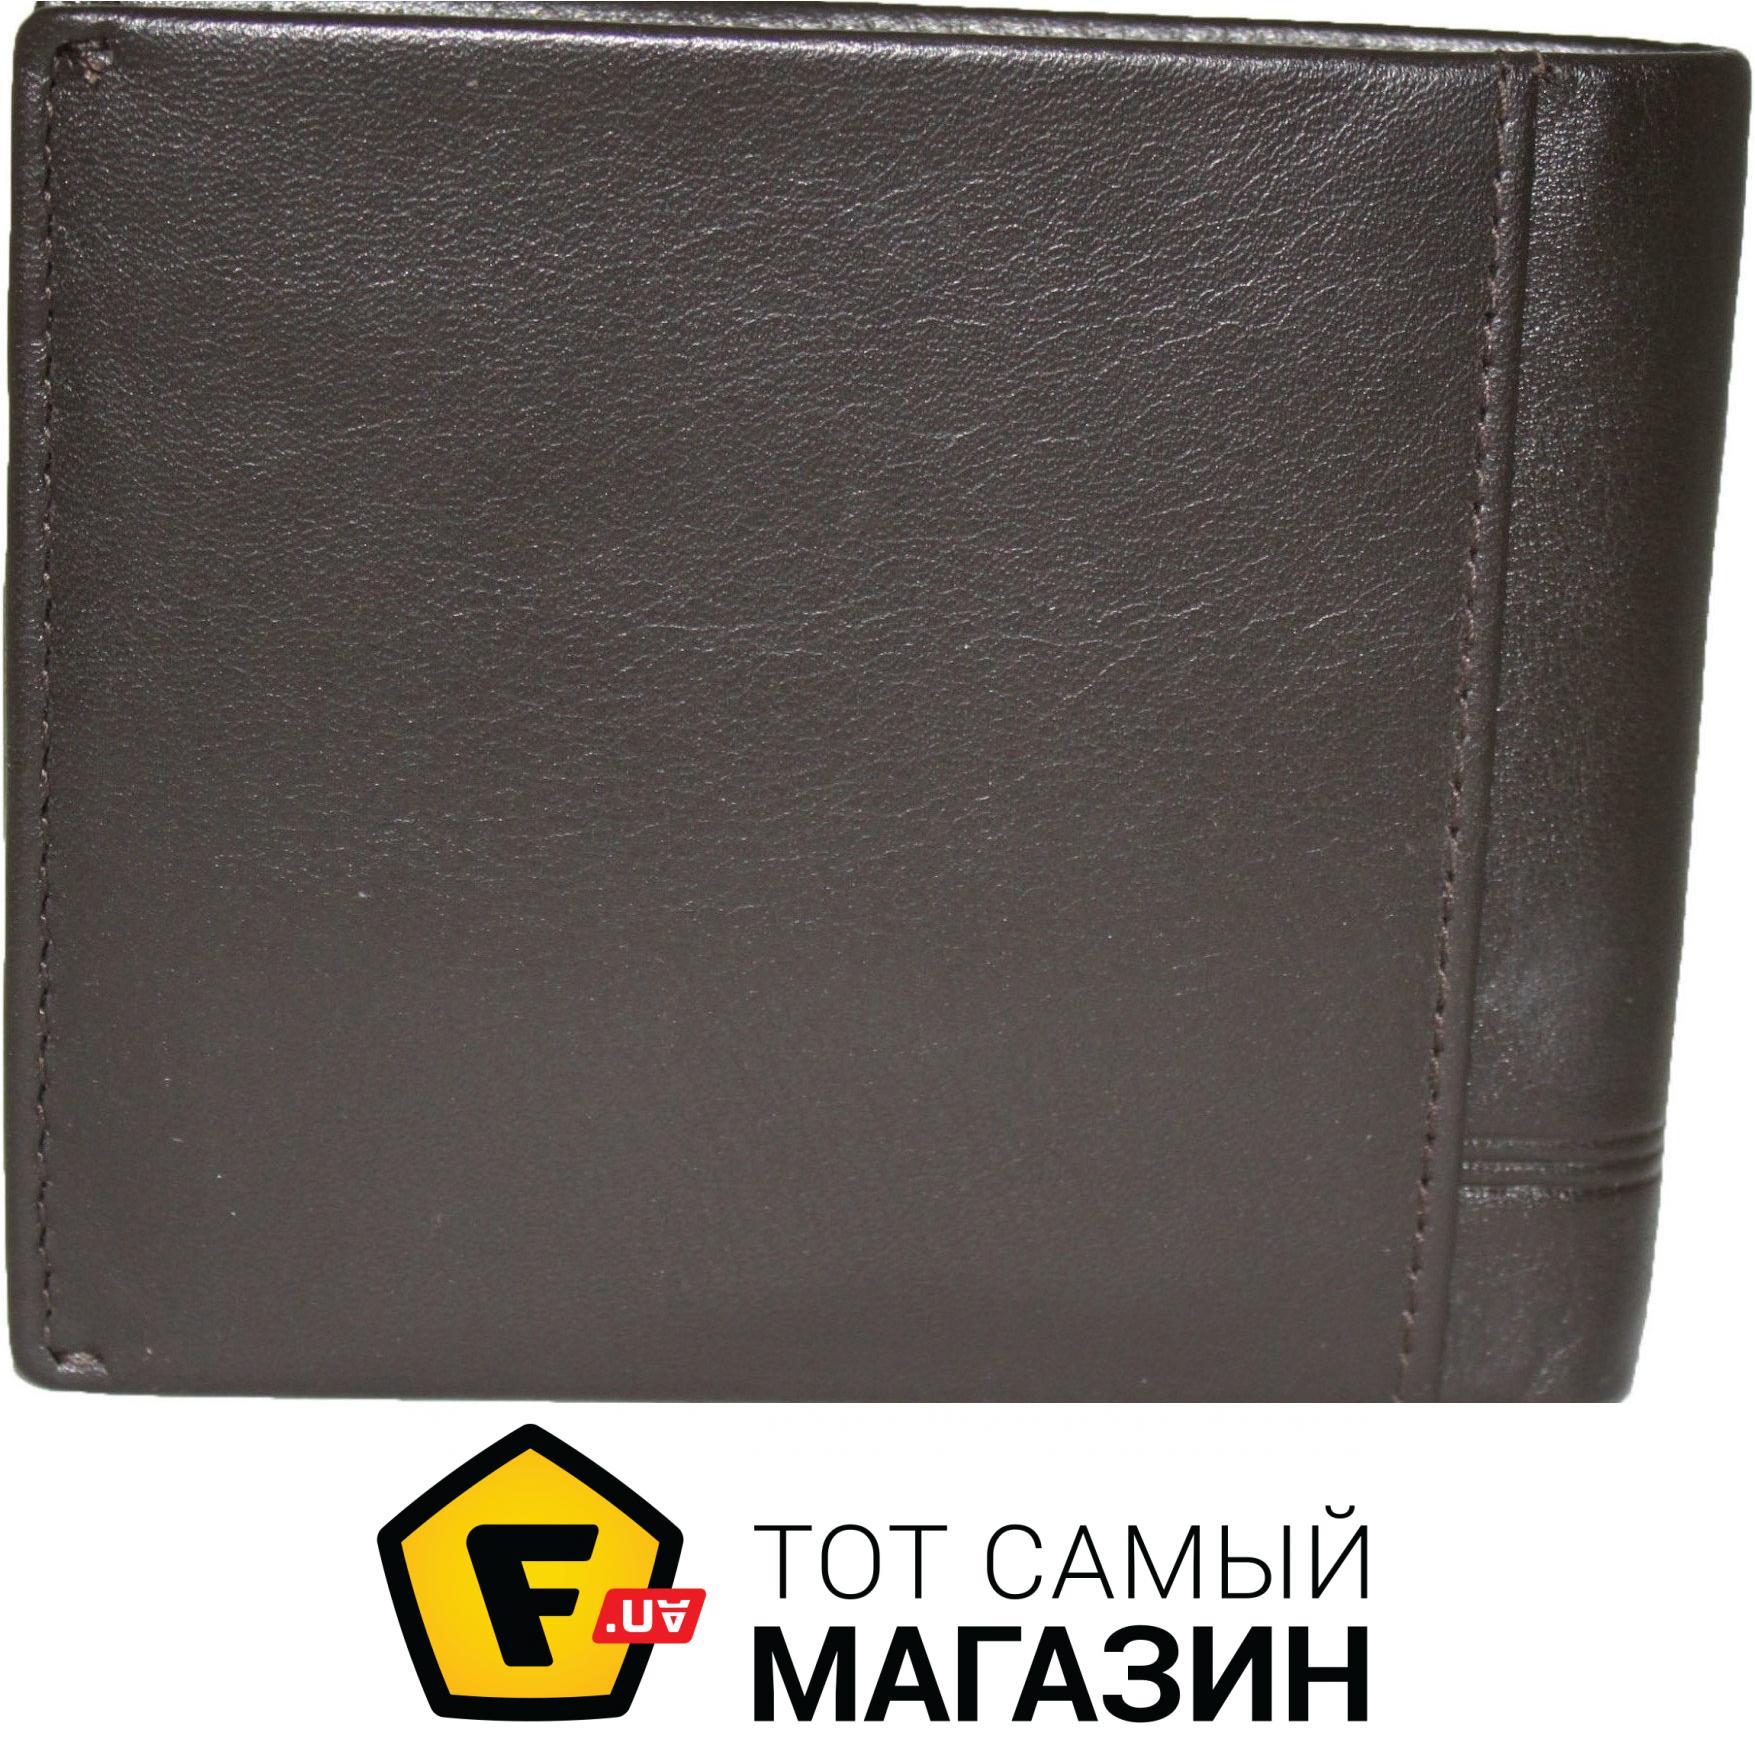 4645187c0acb Кошелек Cross Classic Century коричневый (AC018121B-3) Материал: кожа, 2 из